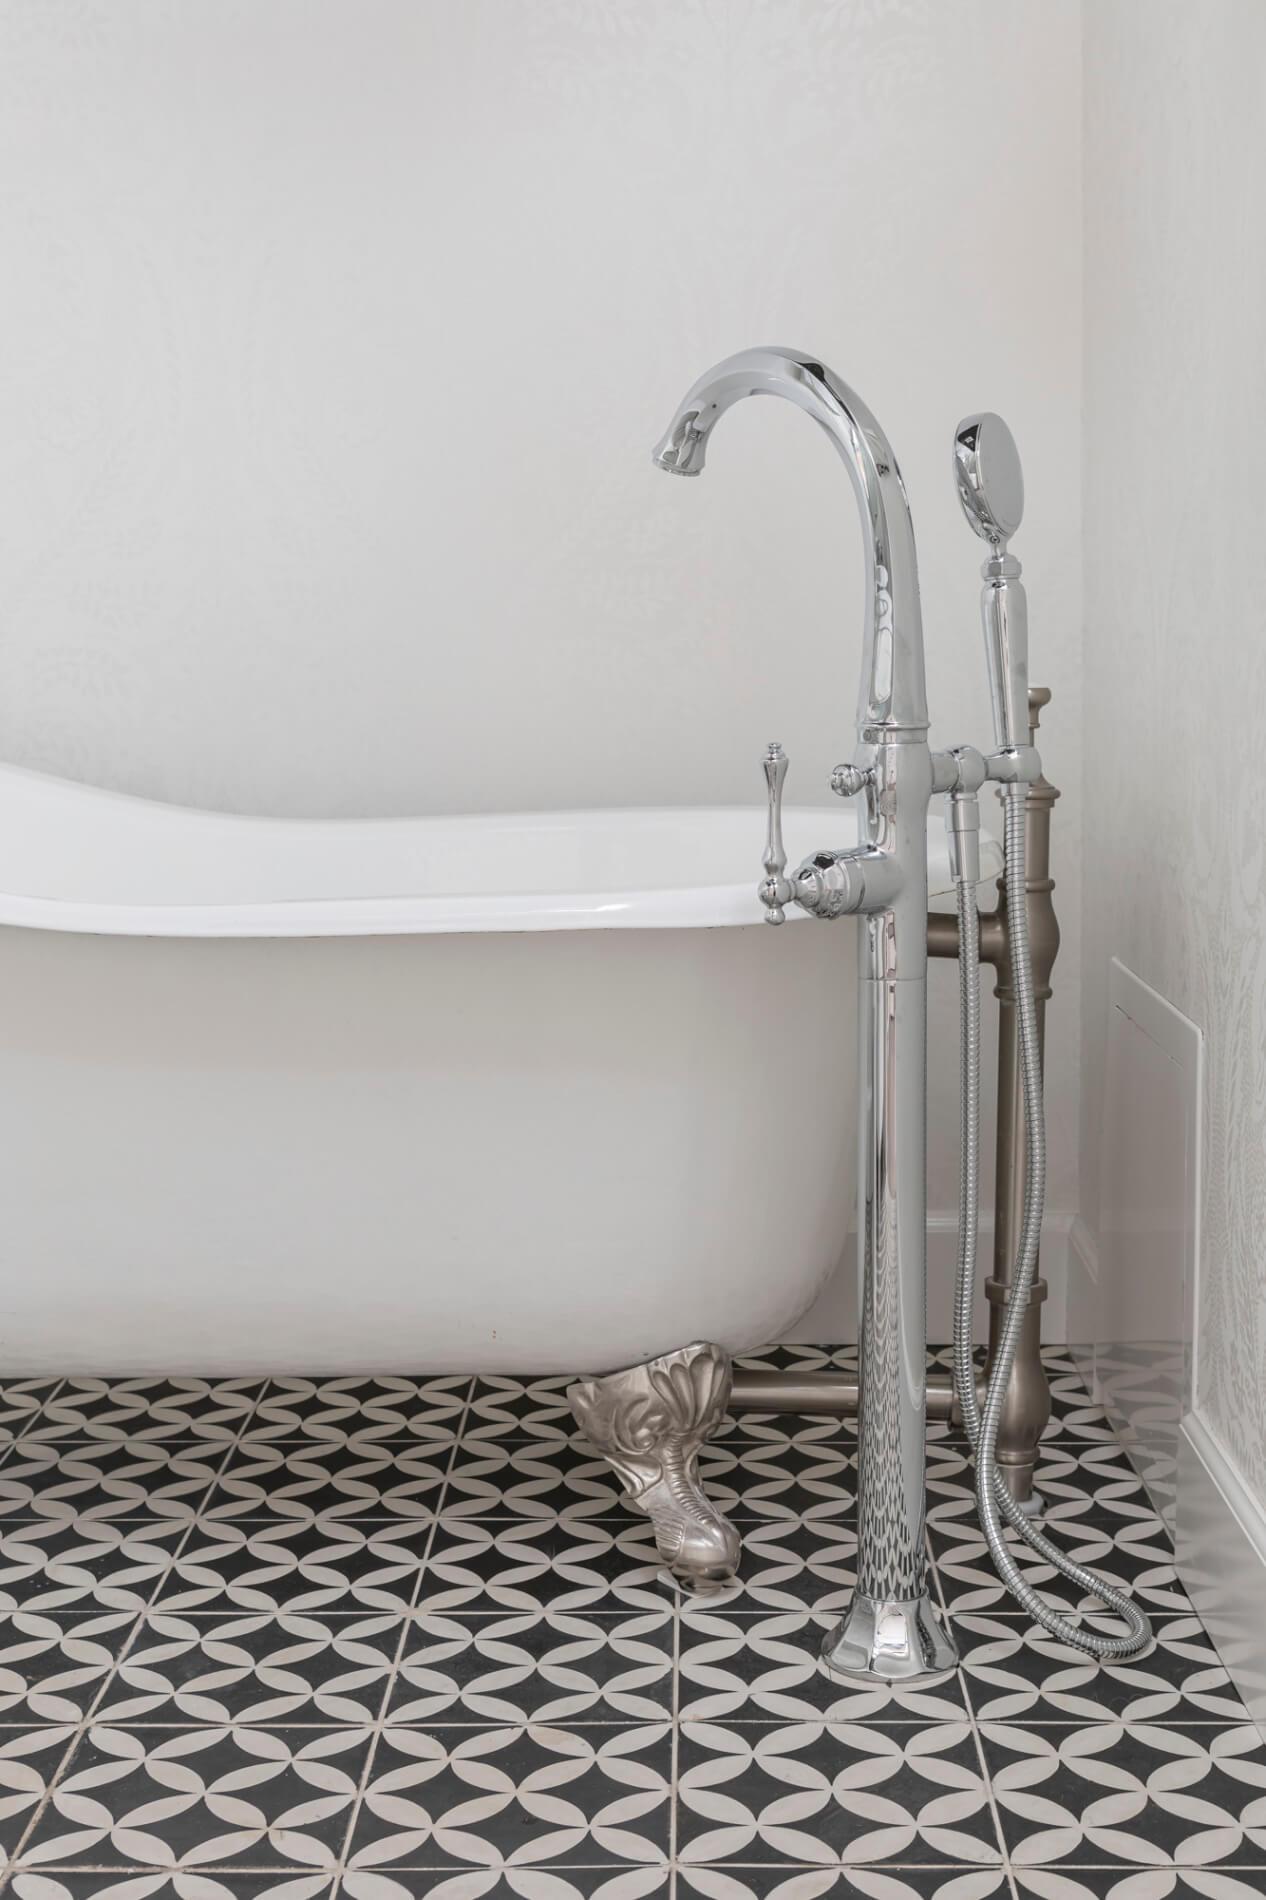 Castaway-tub-in-home-renovation